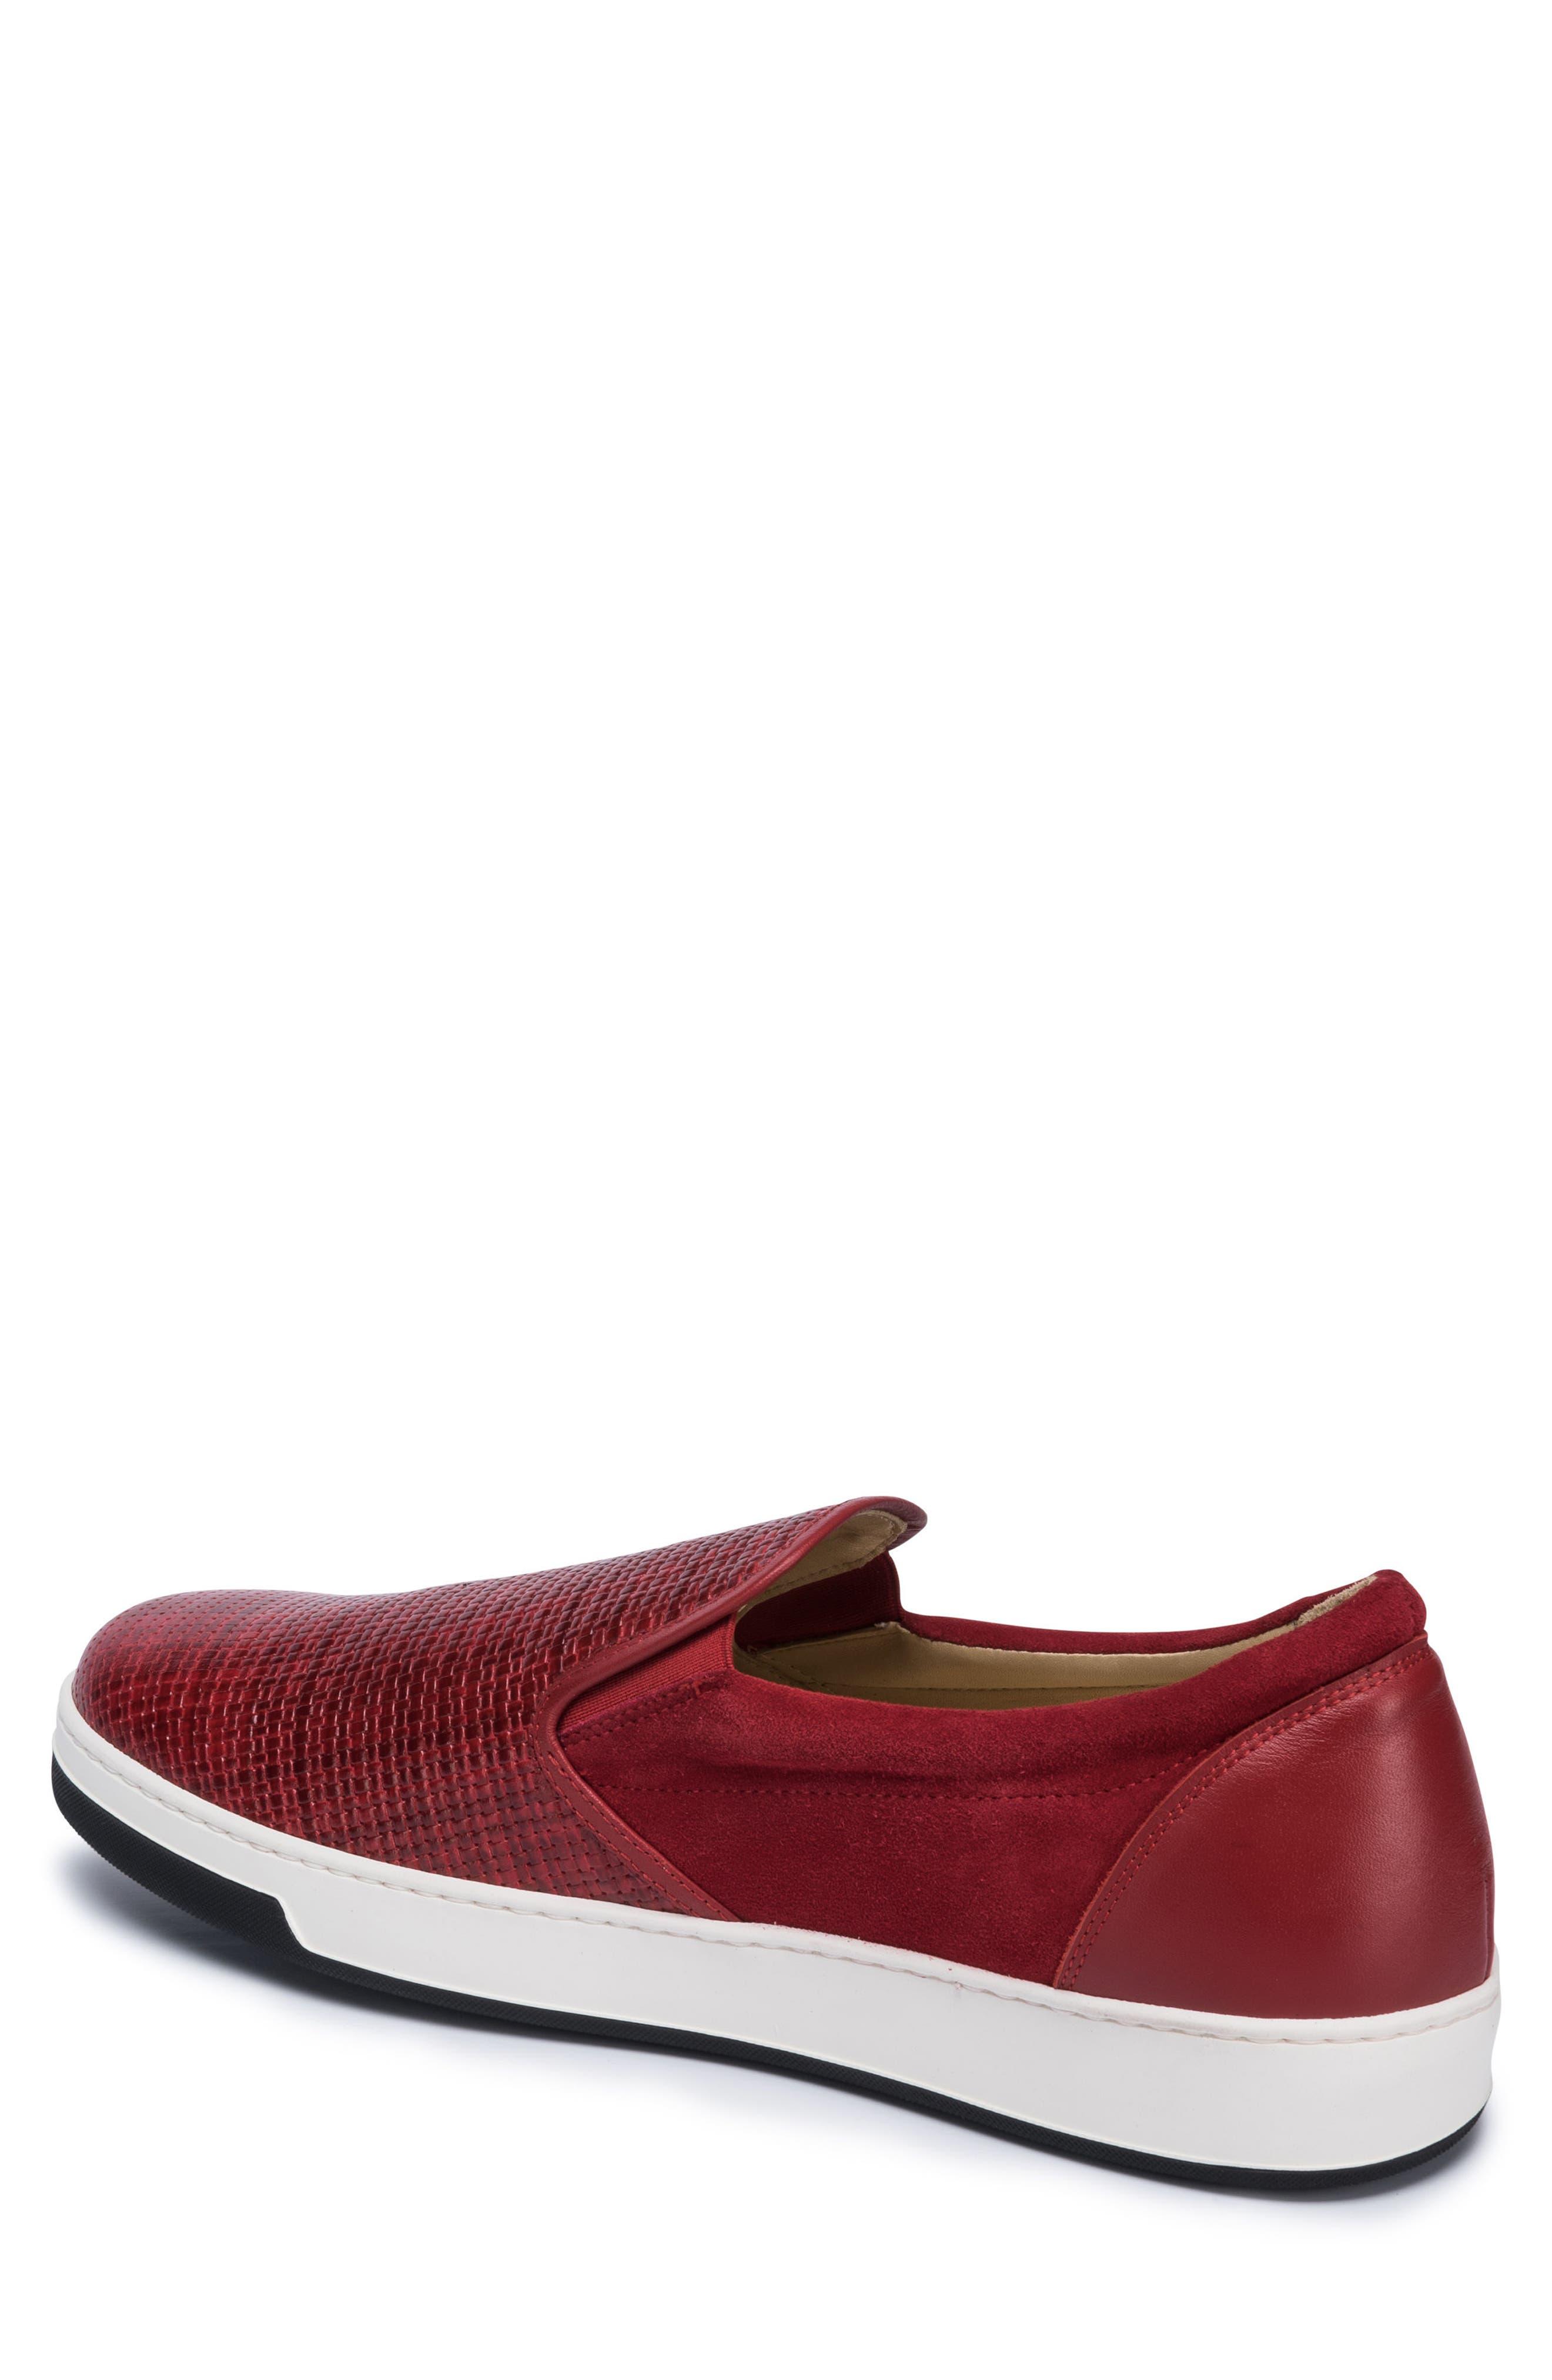 Cinque Terre Woven Slip-On Sneaker,                             Alternate thumbnail 6, color,